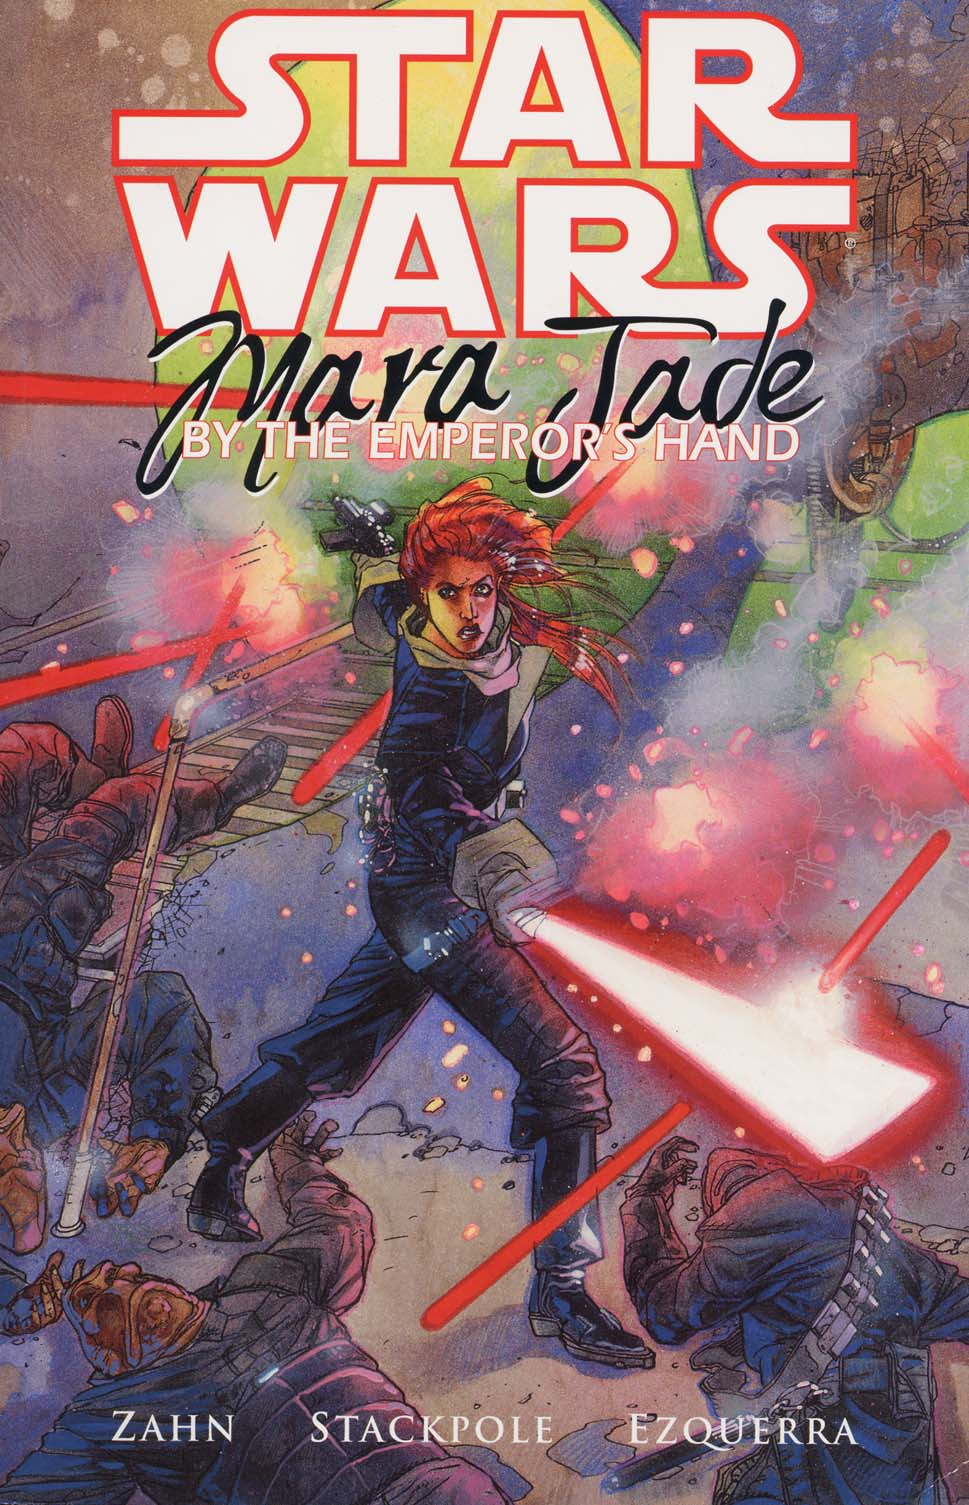 Star Wars Legends Mara Jade